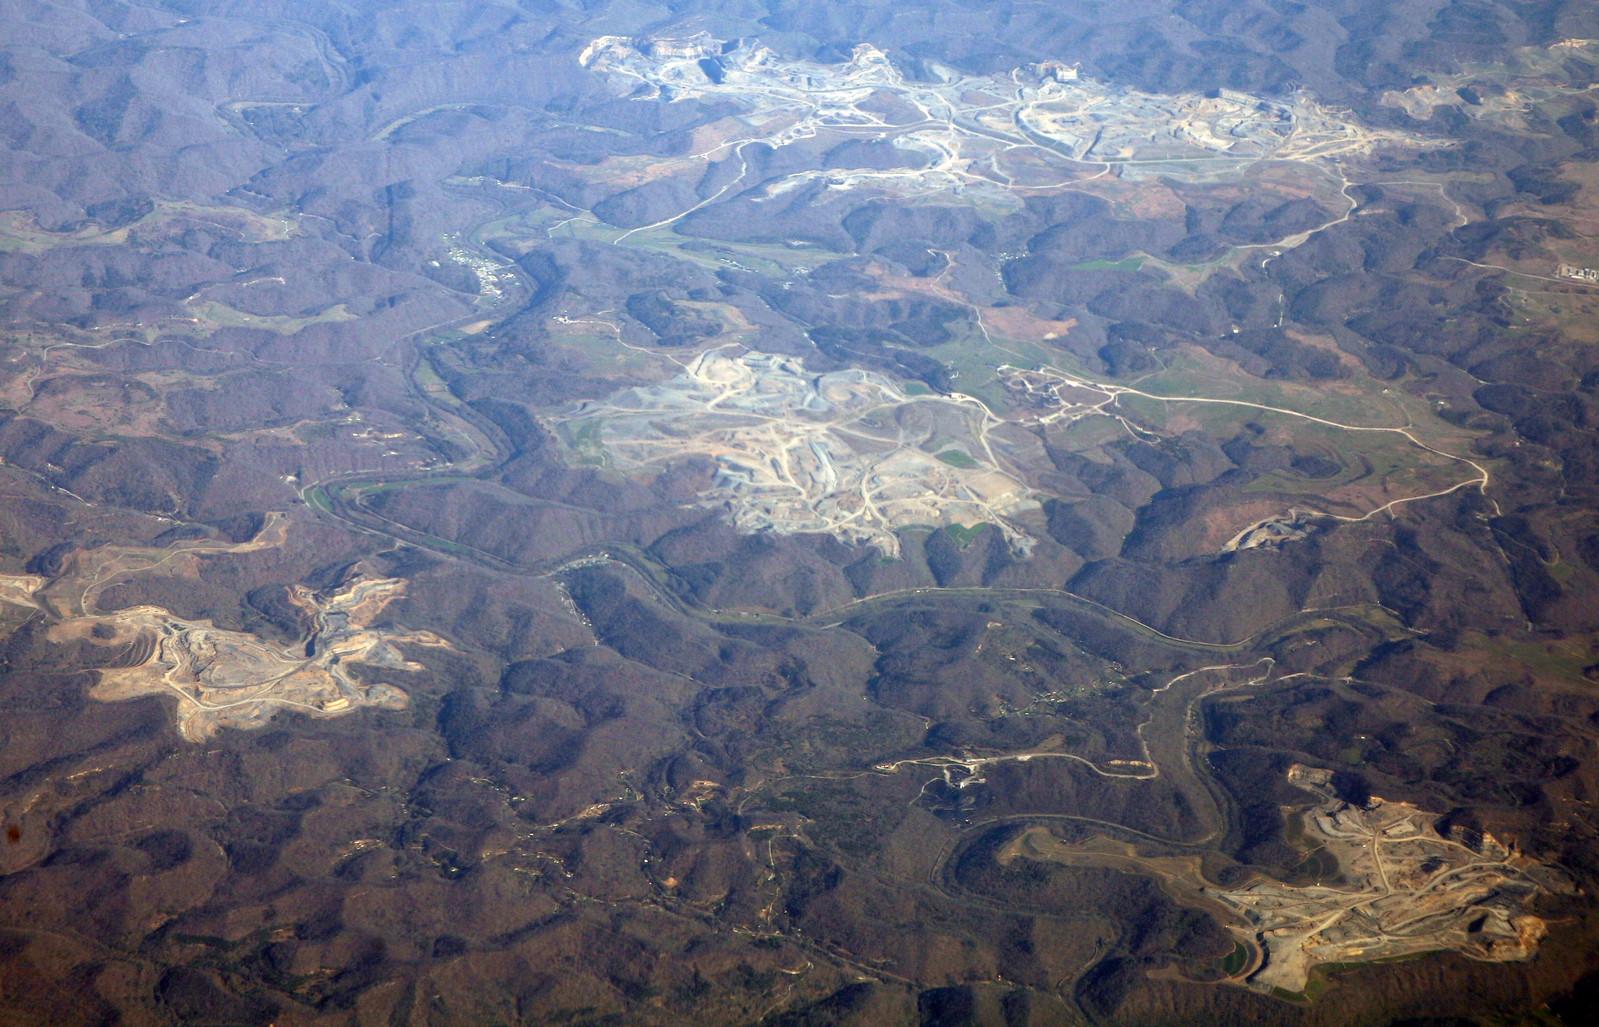 photo of mountaintop mining in Kentucky